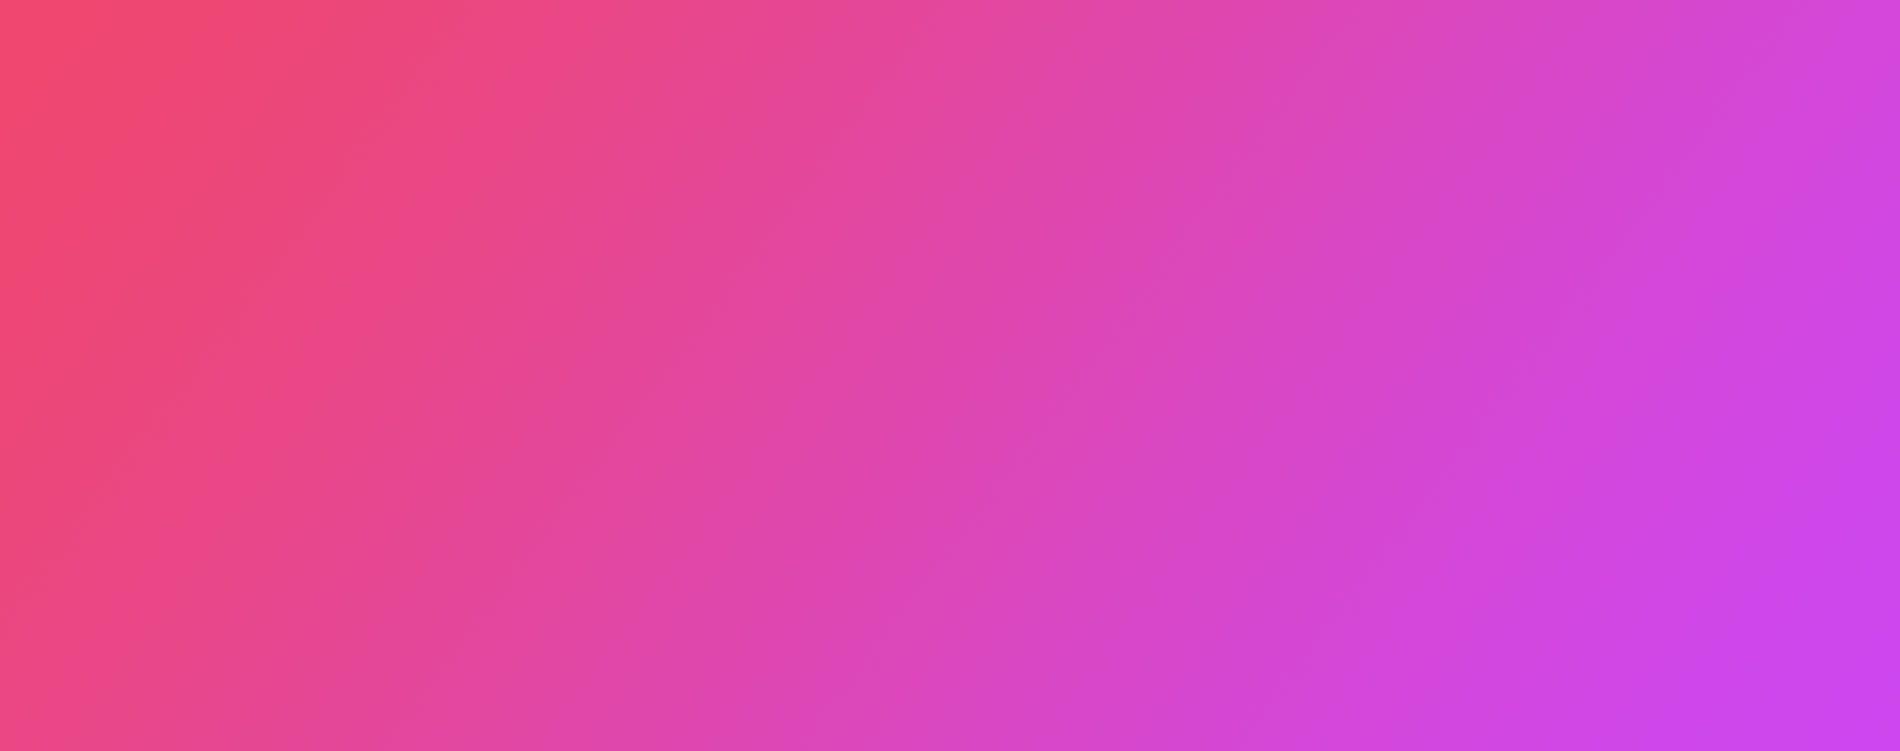 pink/purple background